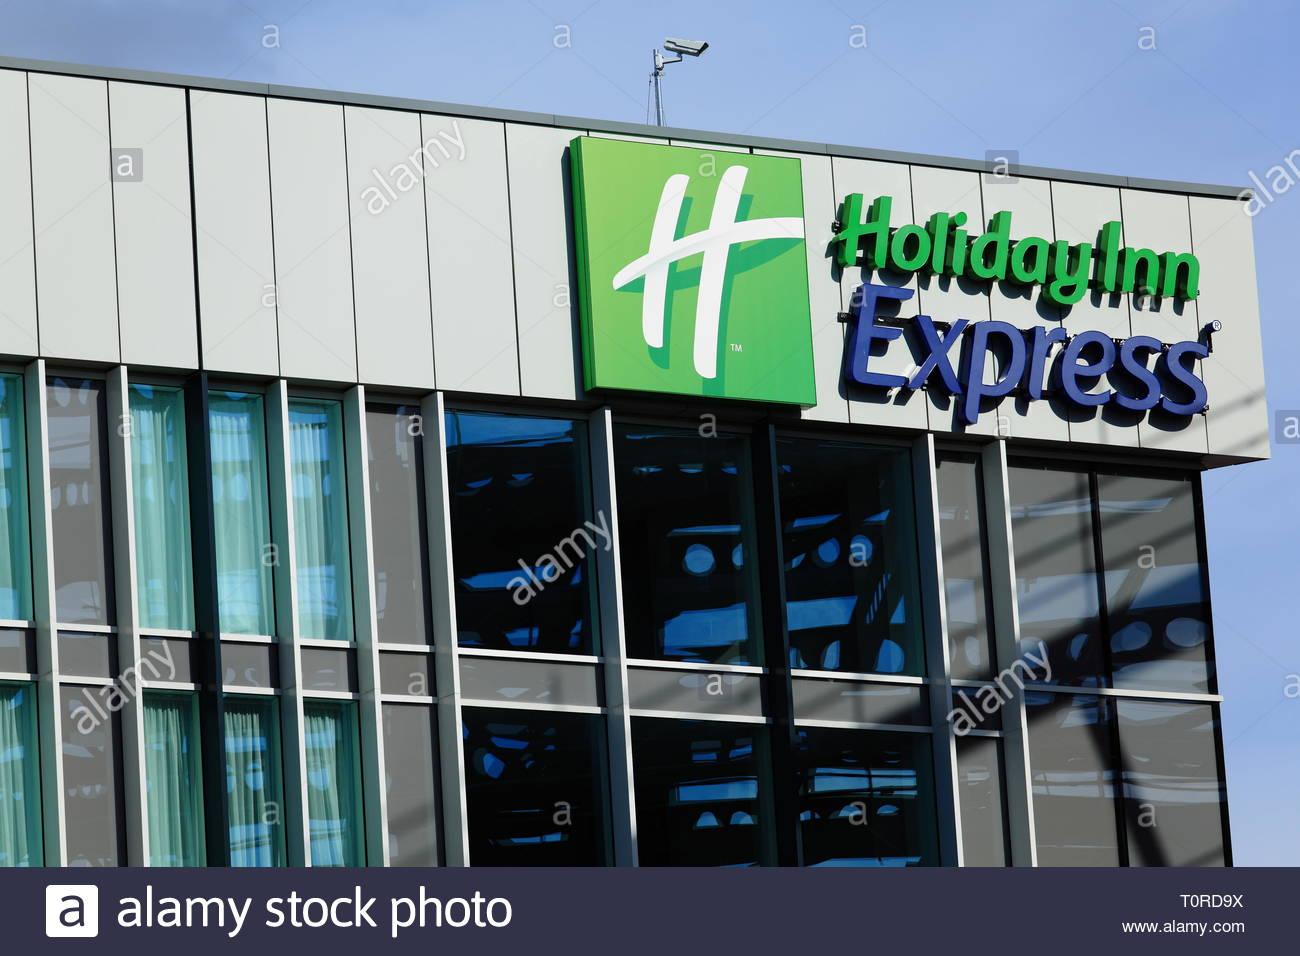 Holiday Inn Express at Stockport UK - Stock Image